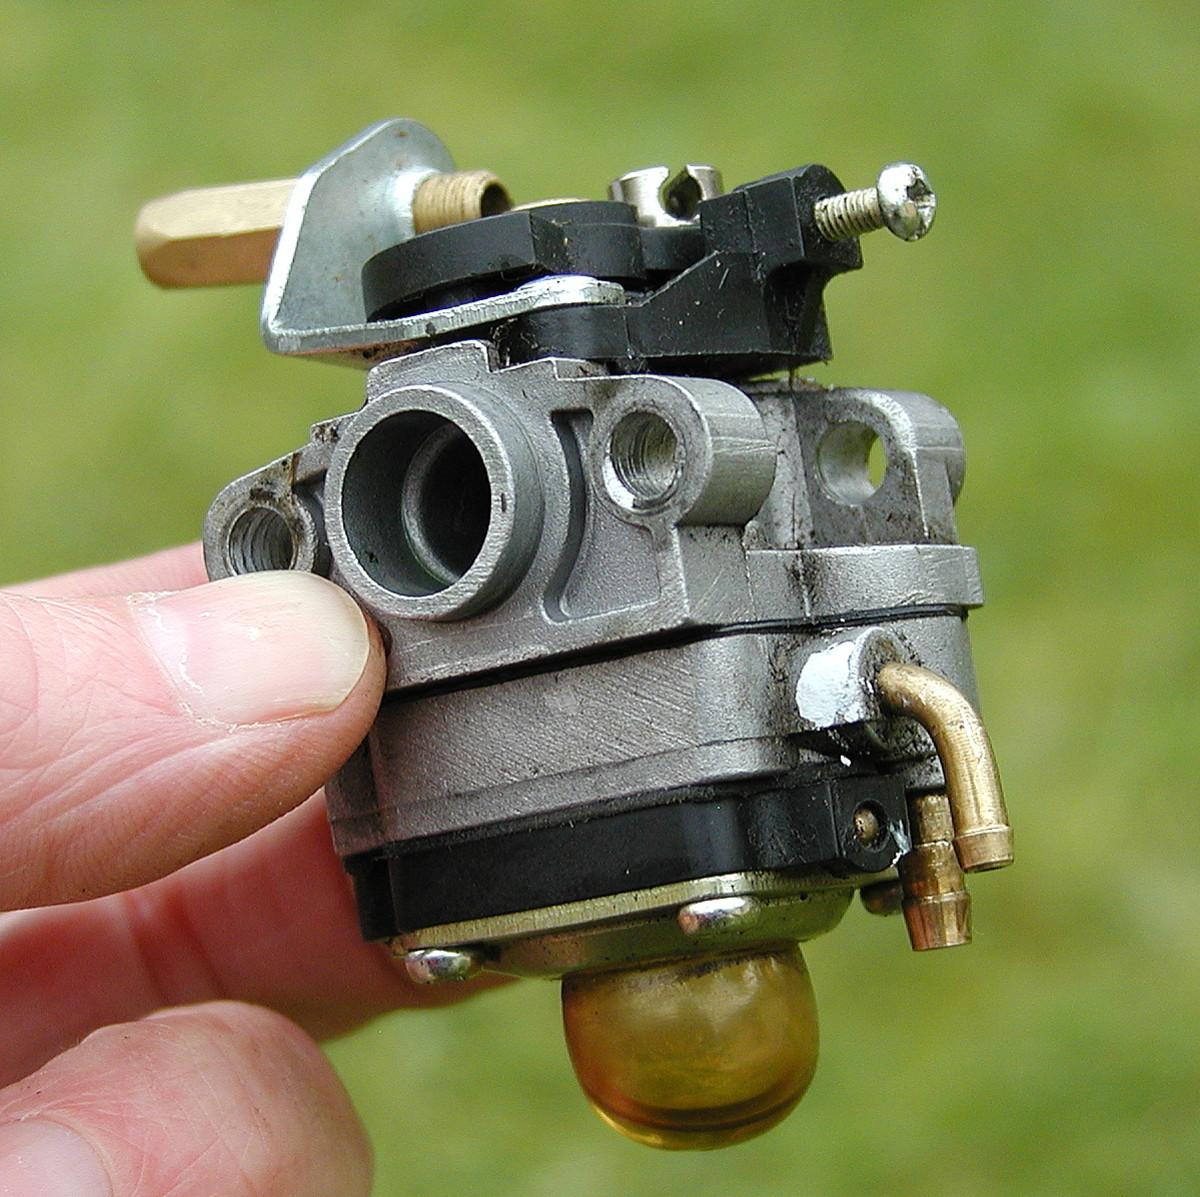 String Trimmer Won't Work - 2-Stroke Engine and Carburetor Troubleshooting